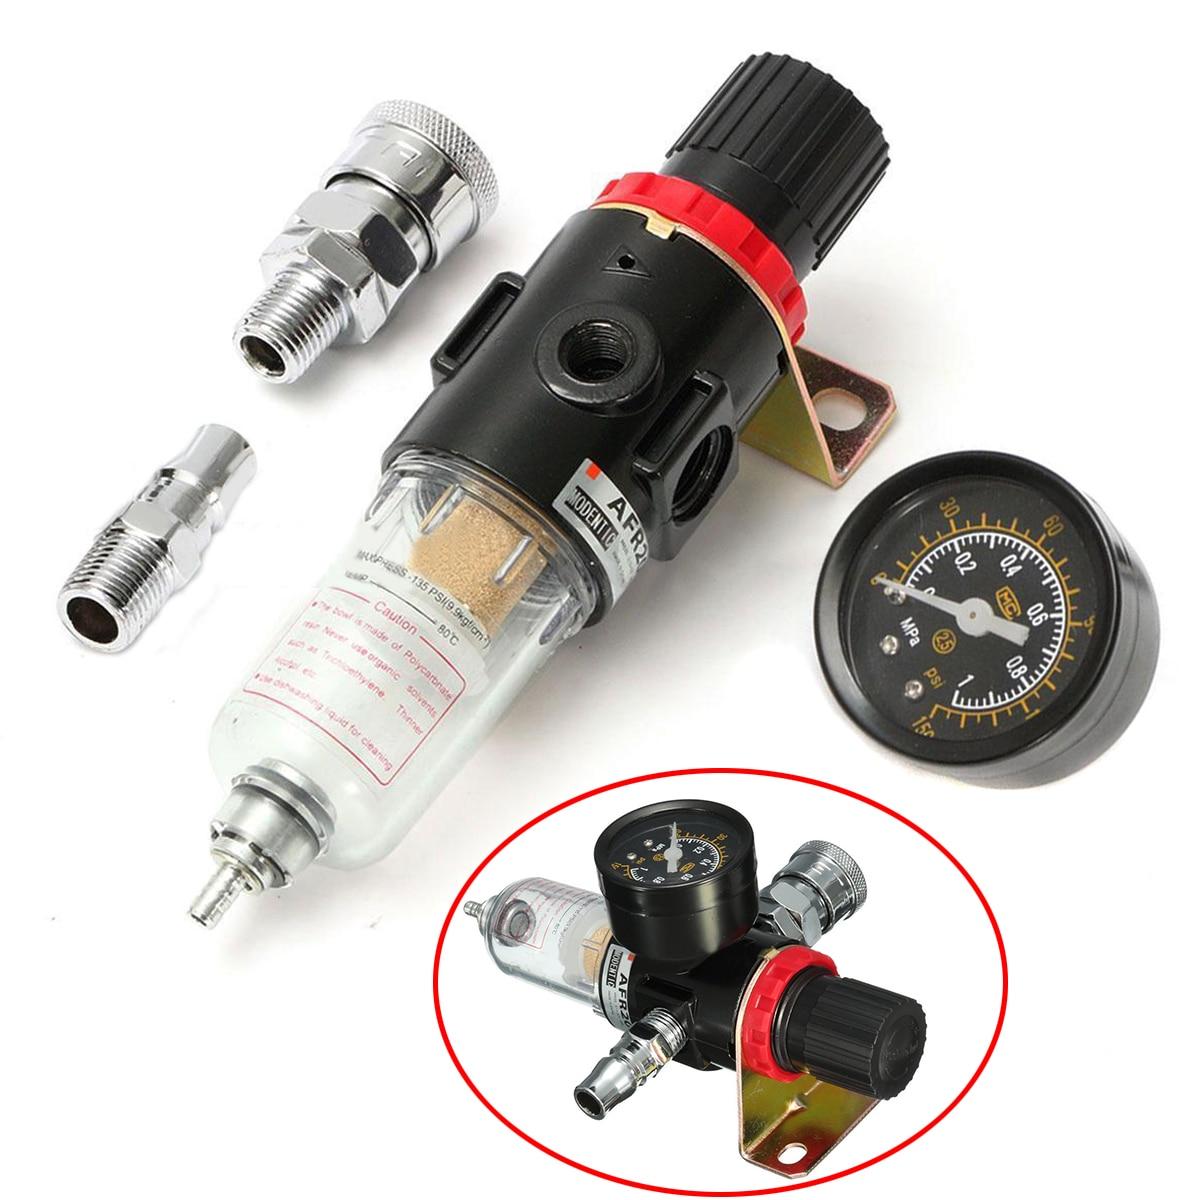 1set AFR2000 1/4 Air Compressor Oil Water Regulator Filter Pressure Gauge Moisture Trap 150x45x50mm